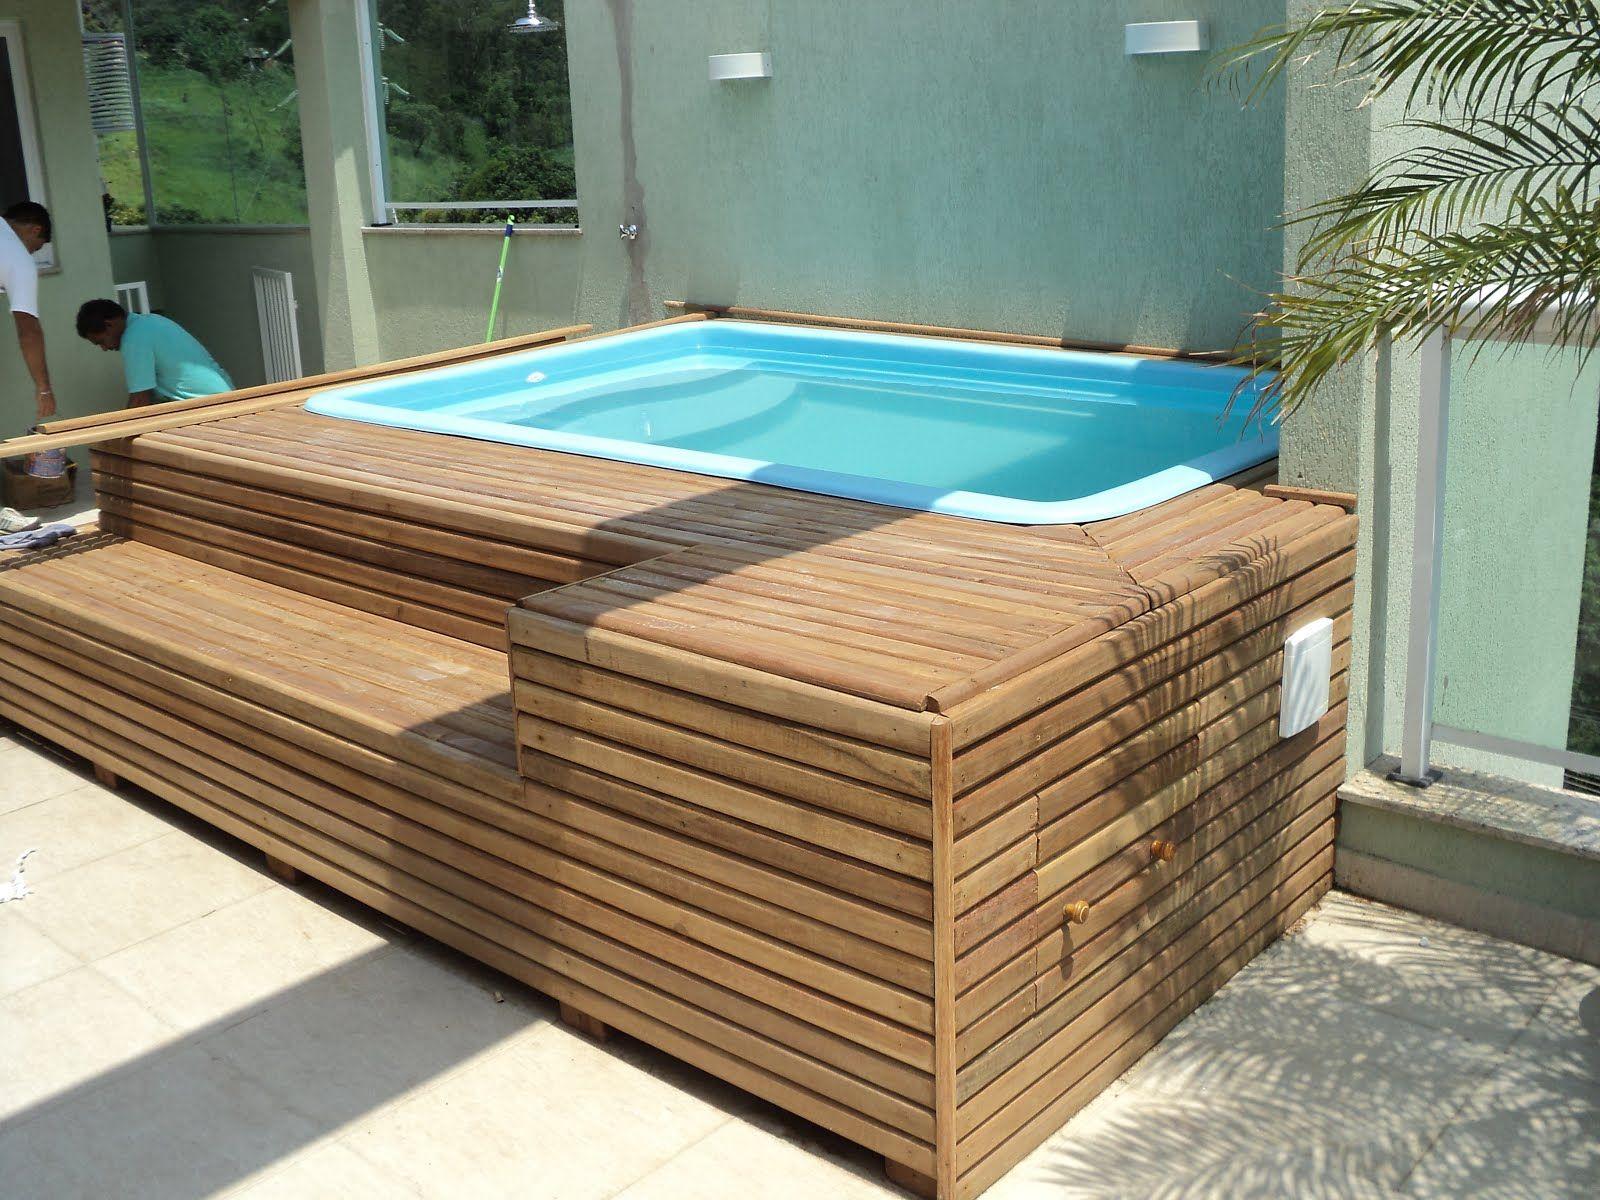 30 fotos de piscina de fibra prepare se para o ver o for Ideas de piscinas grandes